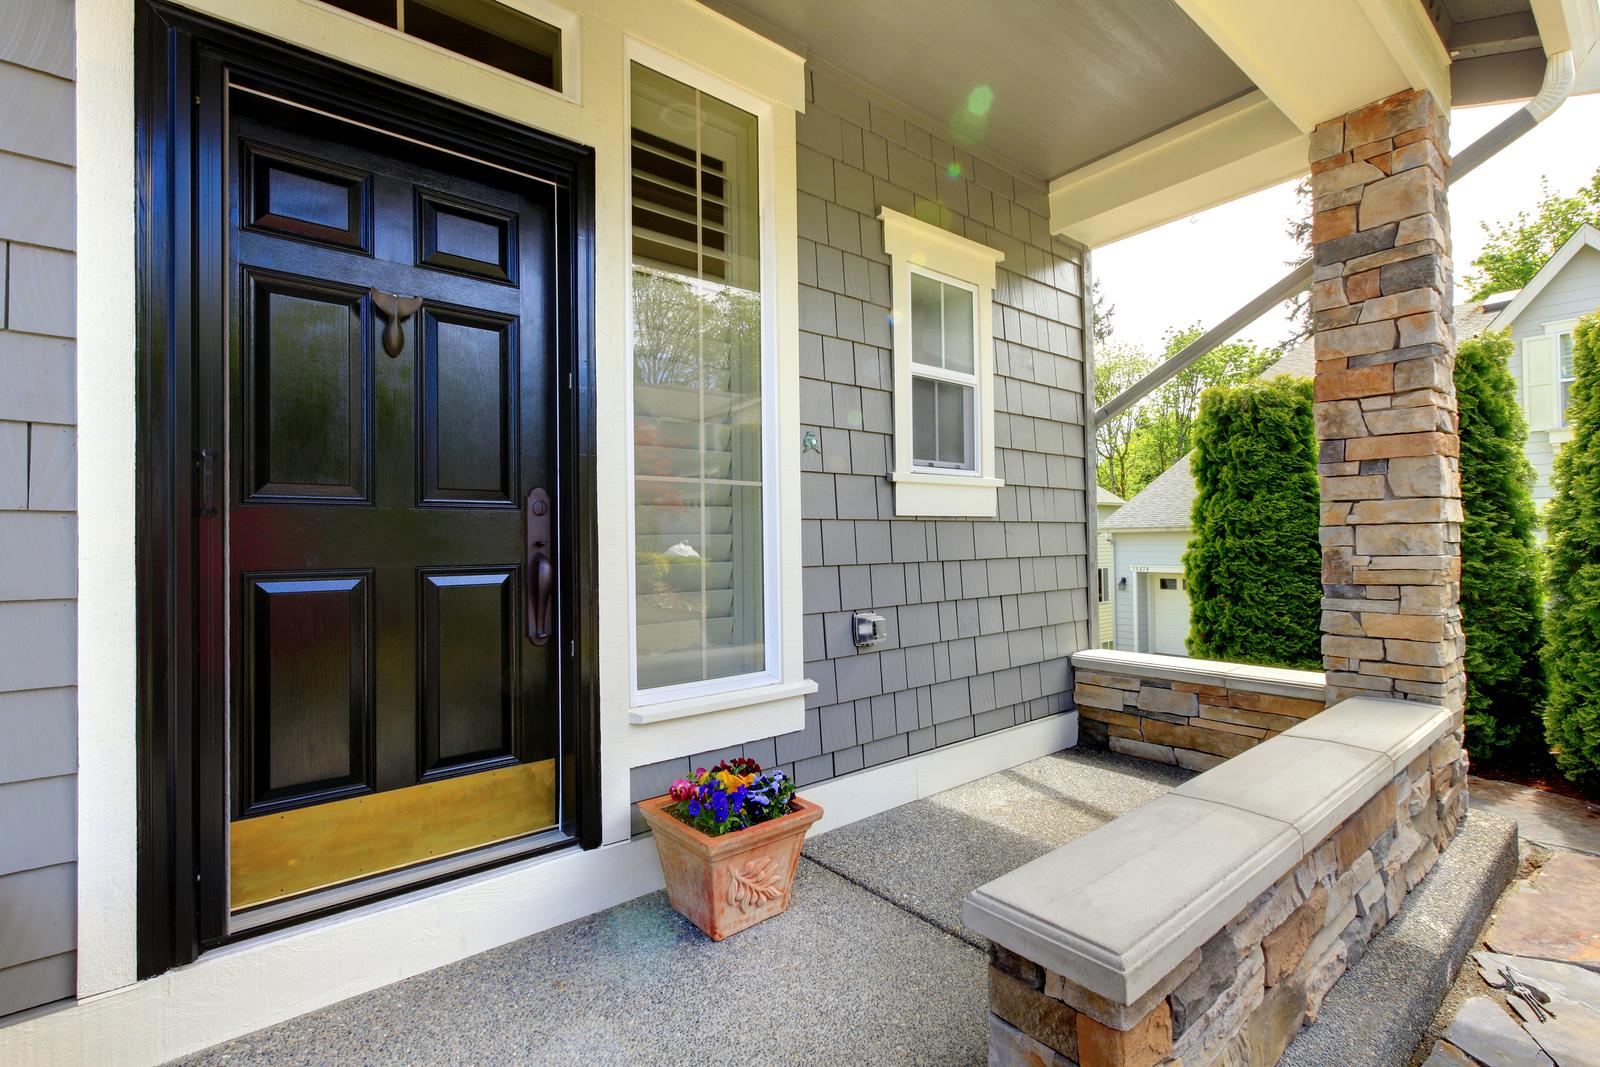 exterior-painting-americanpaintinganddeckcare